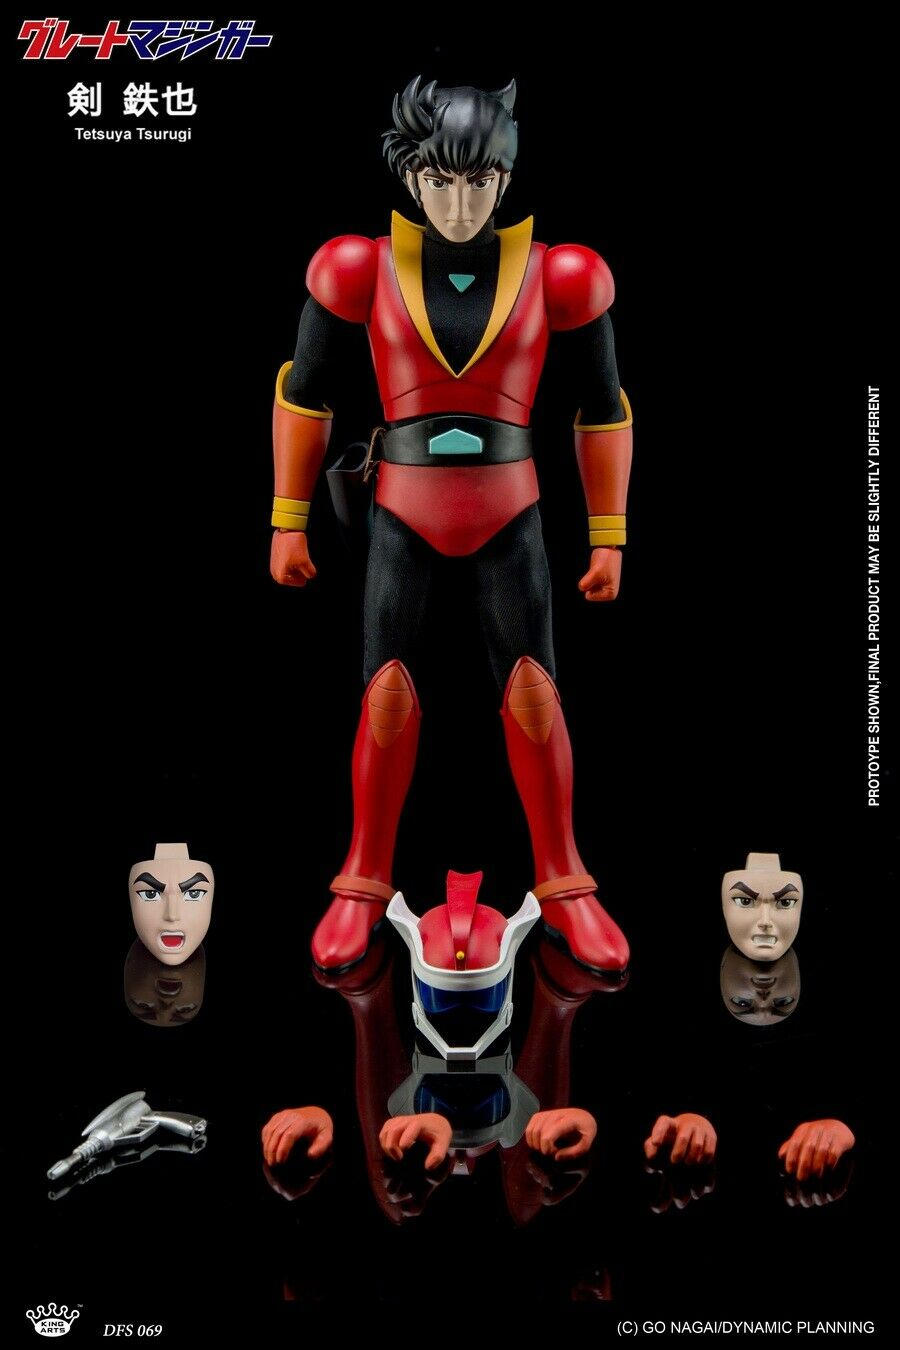 King konsts 22cm DFS069 tärningskast Flexible Tetsuya Tsrugi Moble Action Figur leksak